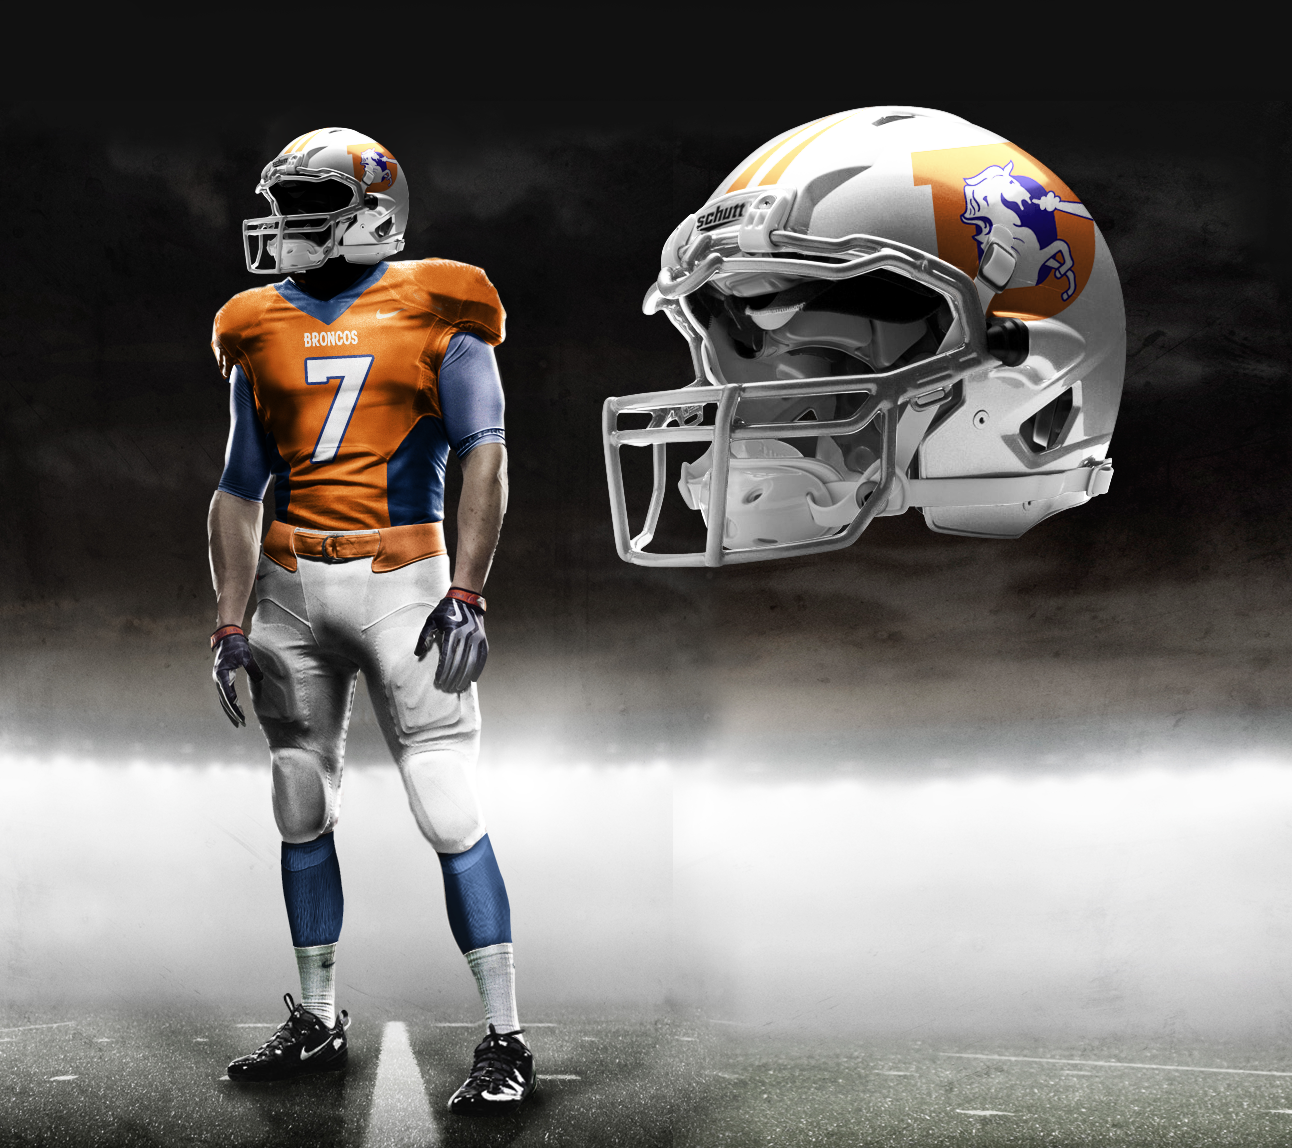 cd184472931 Pittsburgh Steelers Away by Nike. Denver Broncos New Uniforms 2013